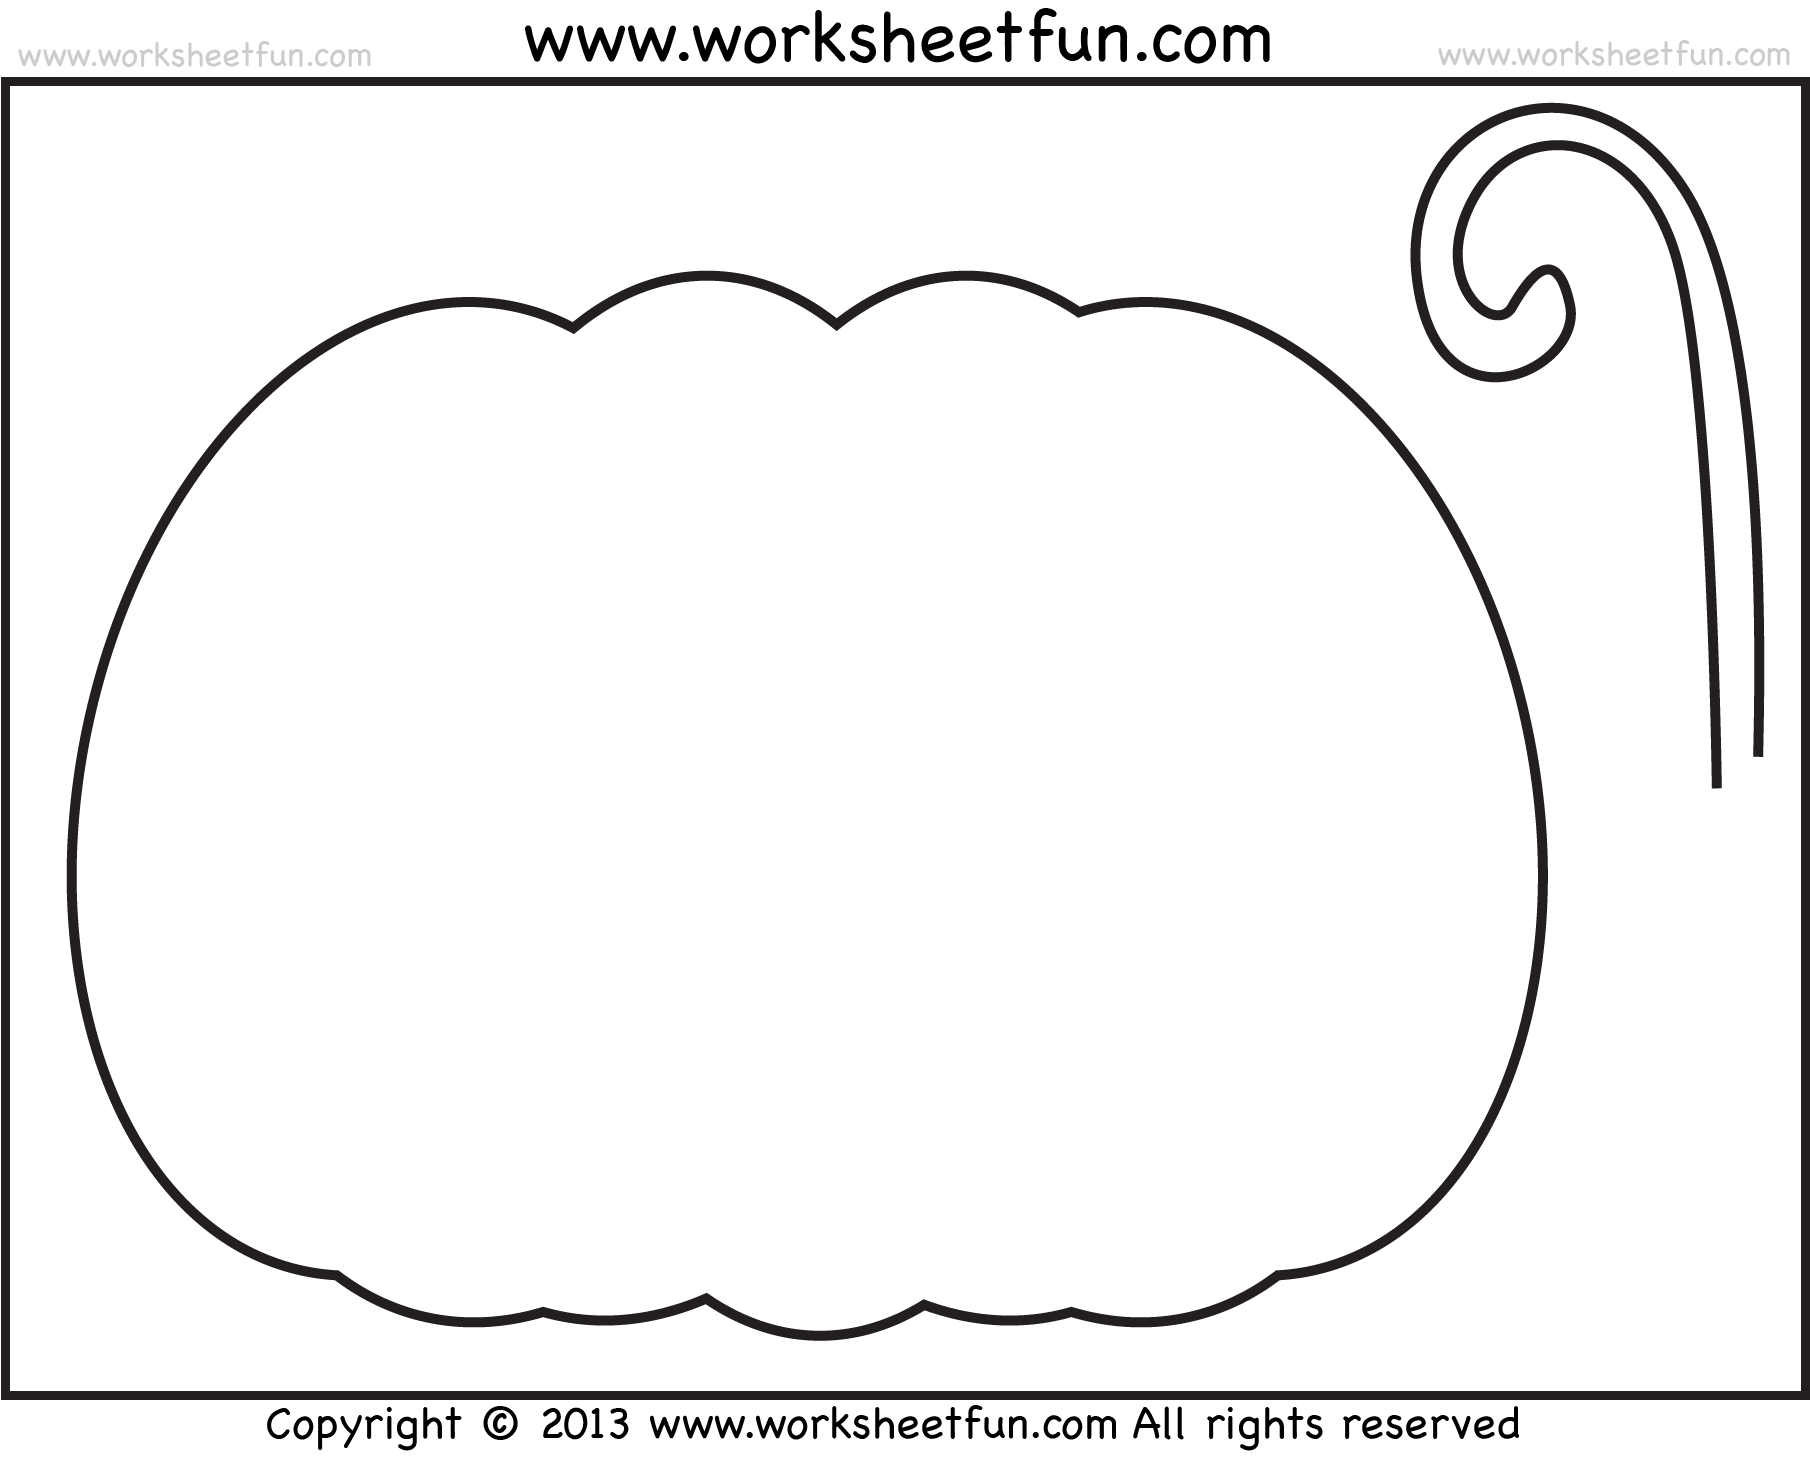 hight resolution of Halloween Printable Stencils for Pumpkin – 2 Worksheets / FREE Printable  Worksheets – Worksheetfun